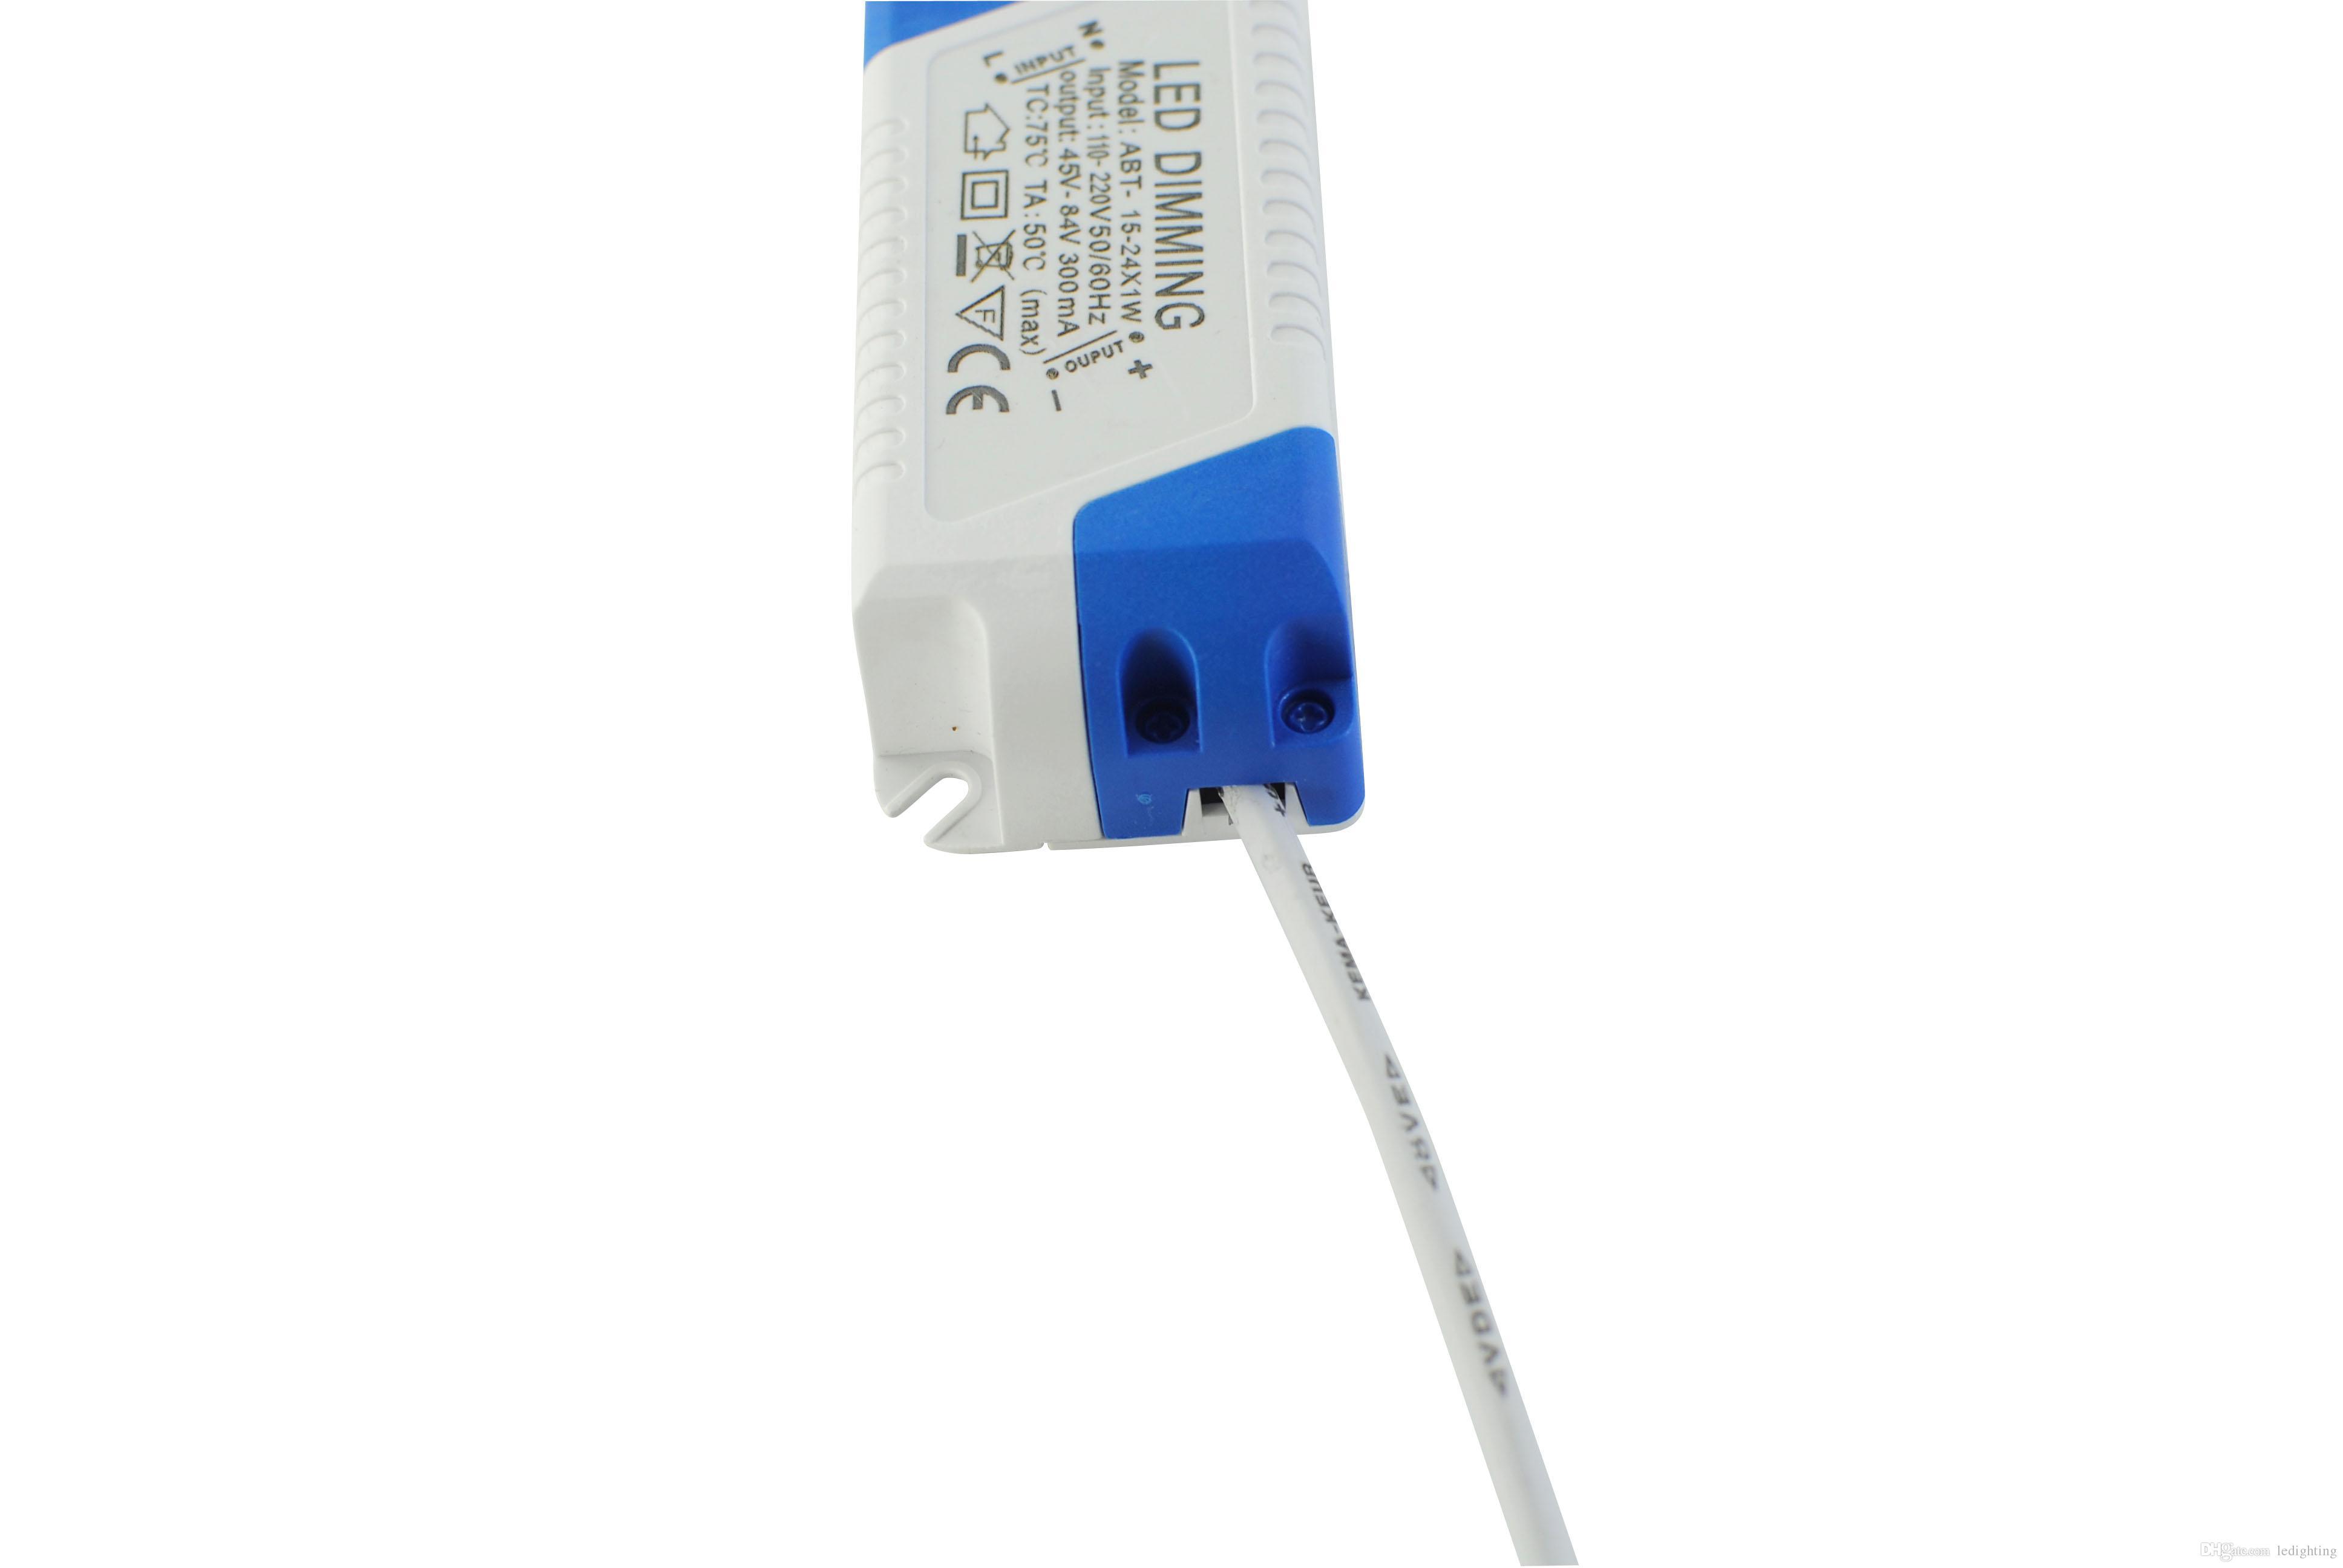 BSOD Dimmable LED Treiber 15-24 W Eingang Ausgang 45-84 V Konstantstrom Externe Dimming Stromversorgung Led Deckenpaneel Trafo